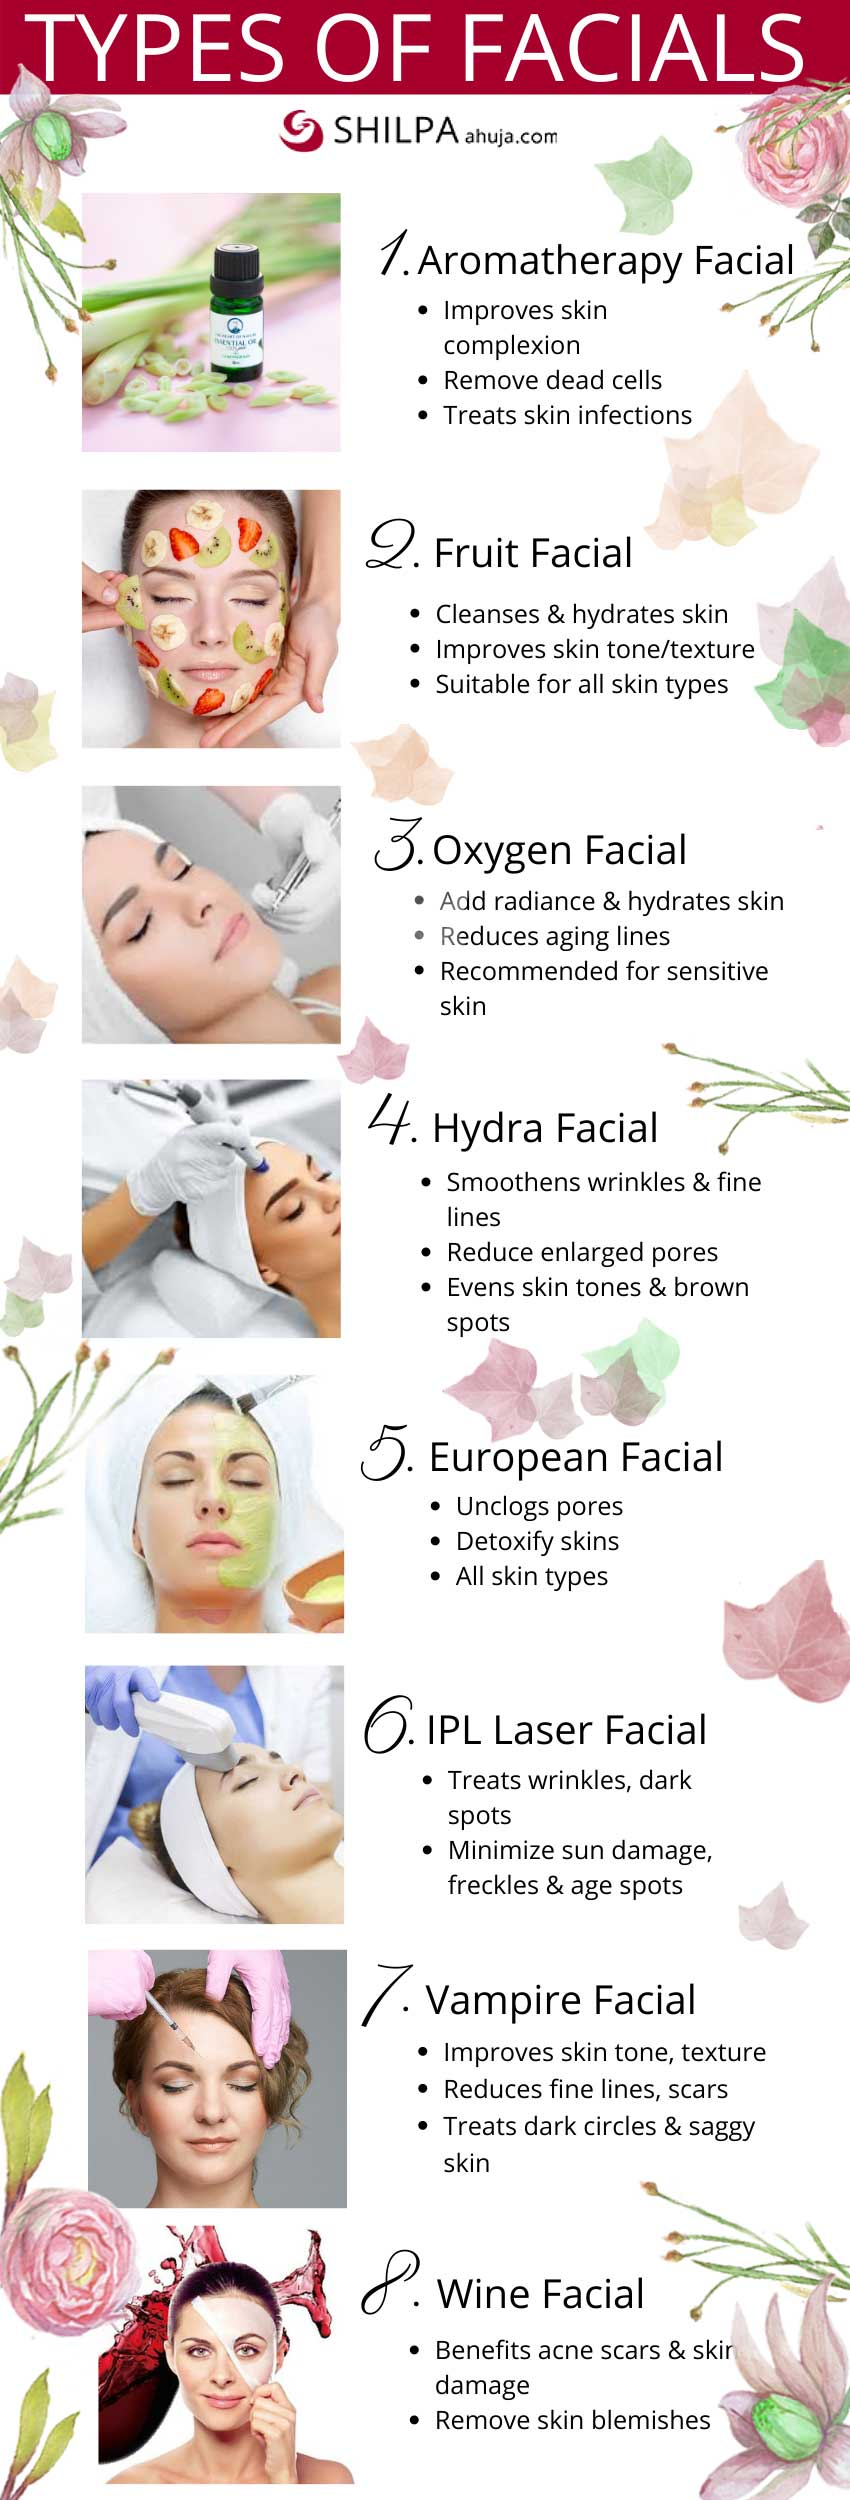 Types-of-facials-oxygen-aromatherapy-vampire